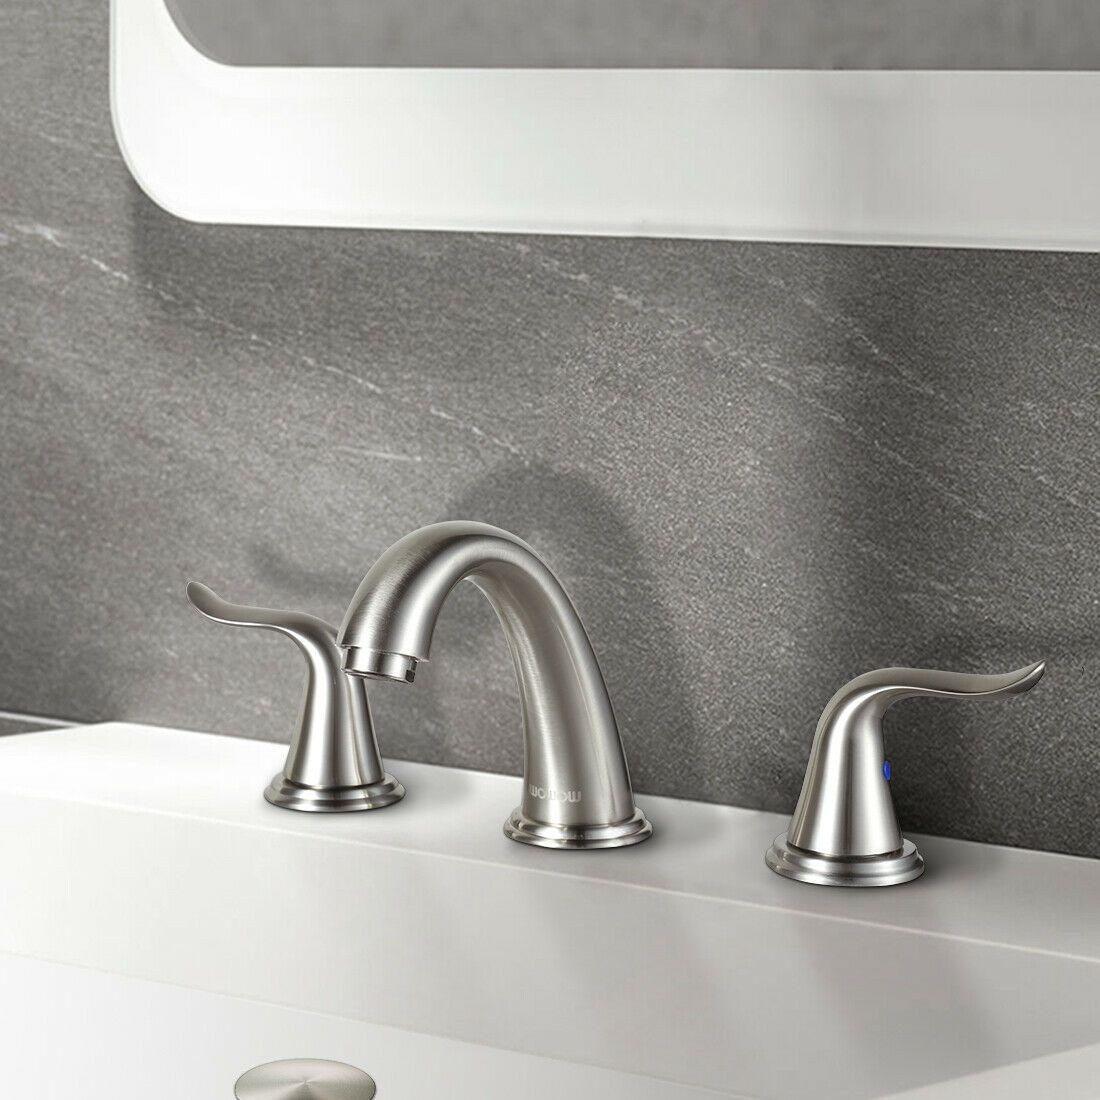 Bathroom Sink Faucet 3 Holes W Overflow Popup Drain Brushed